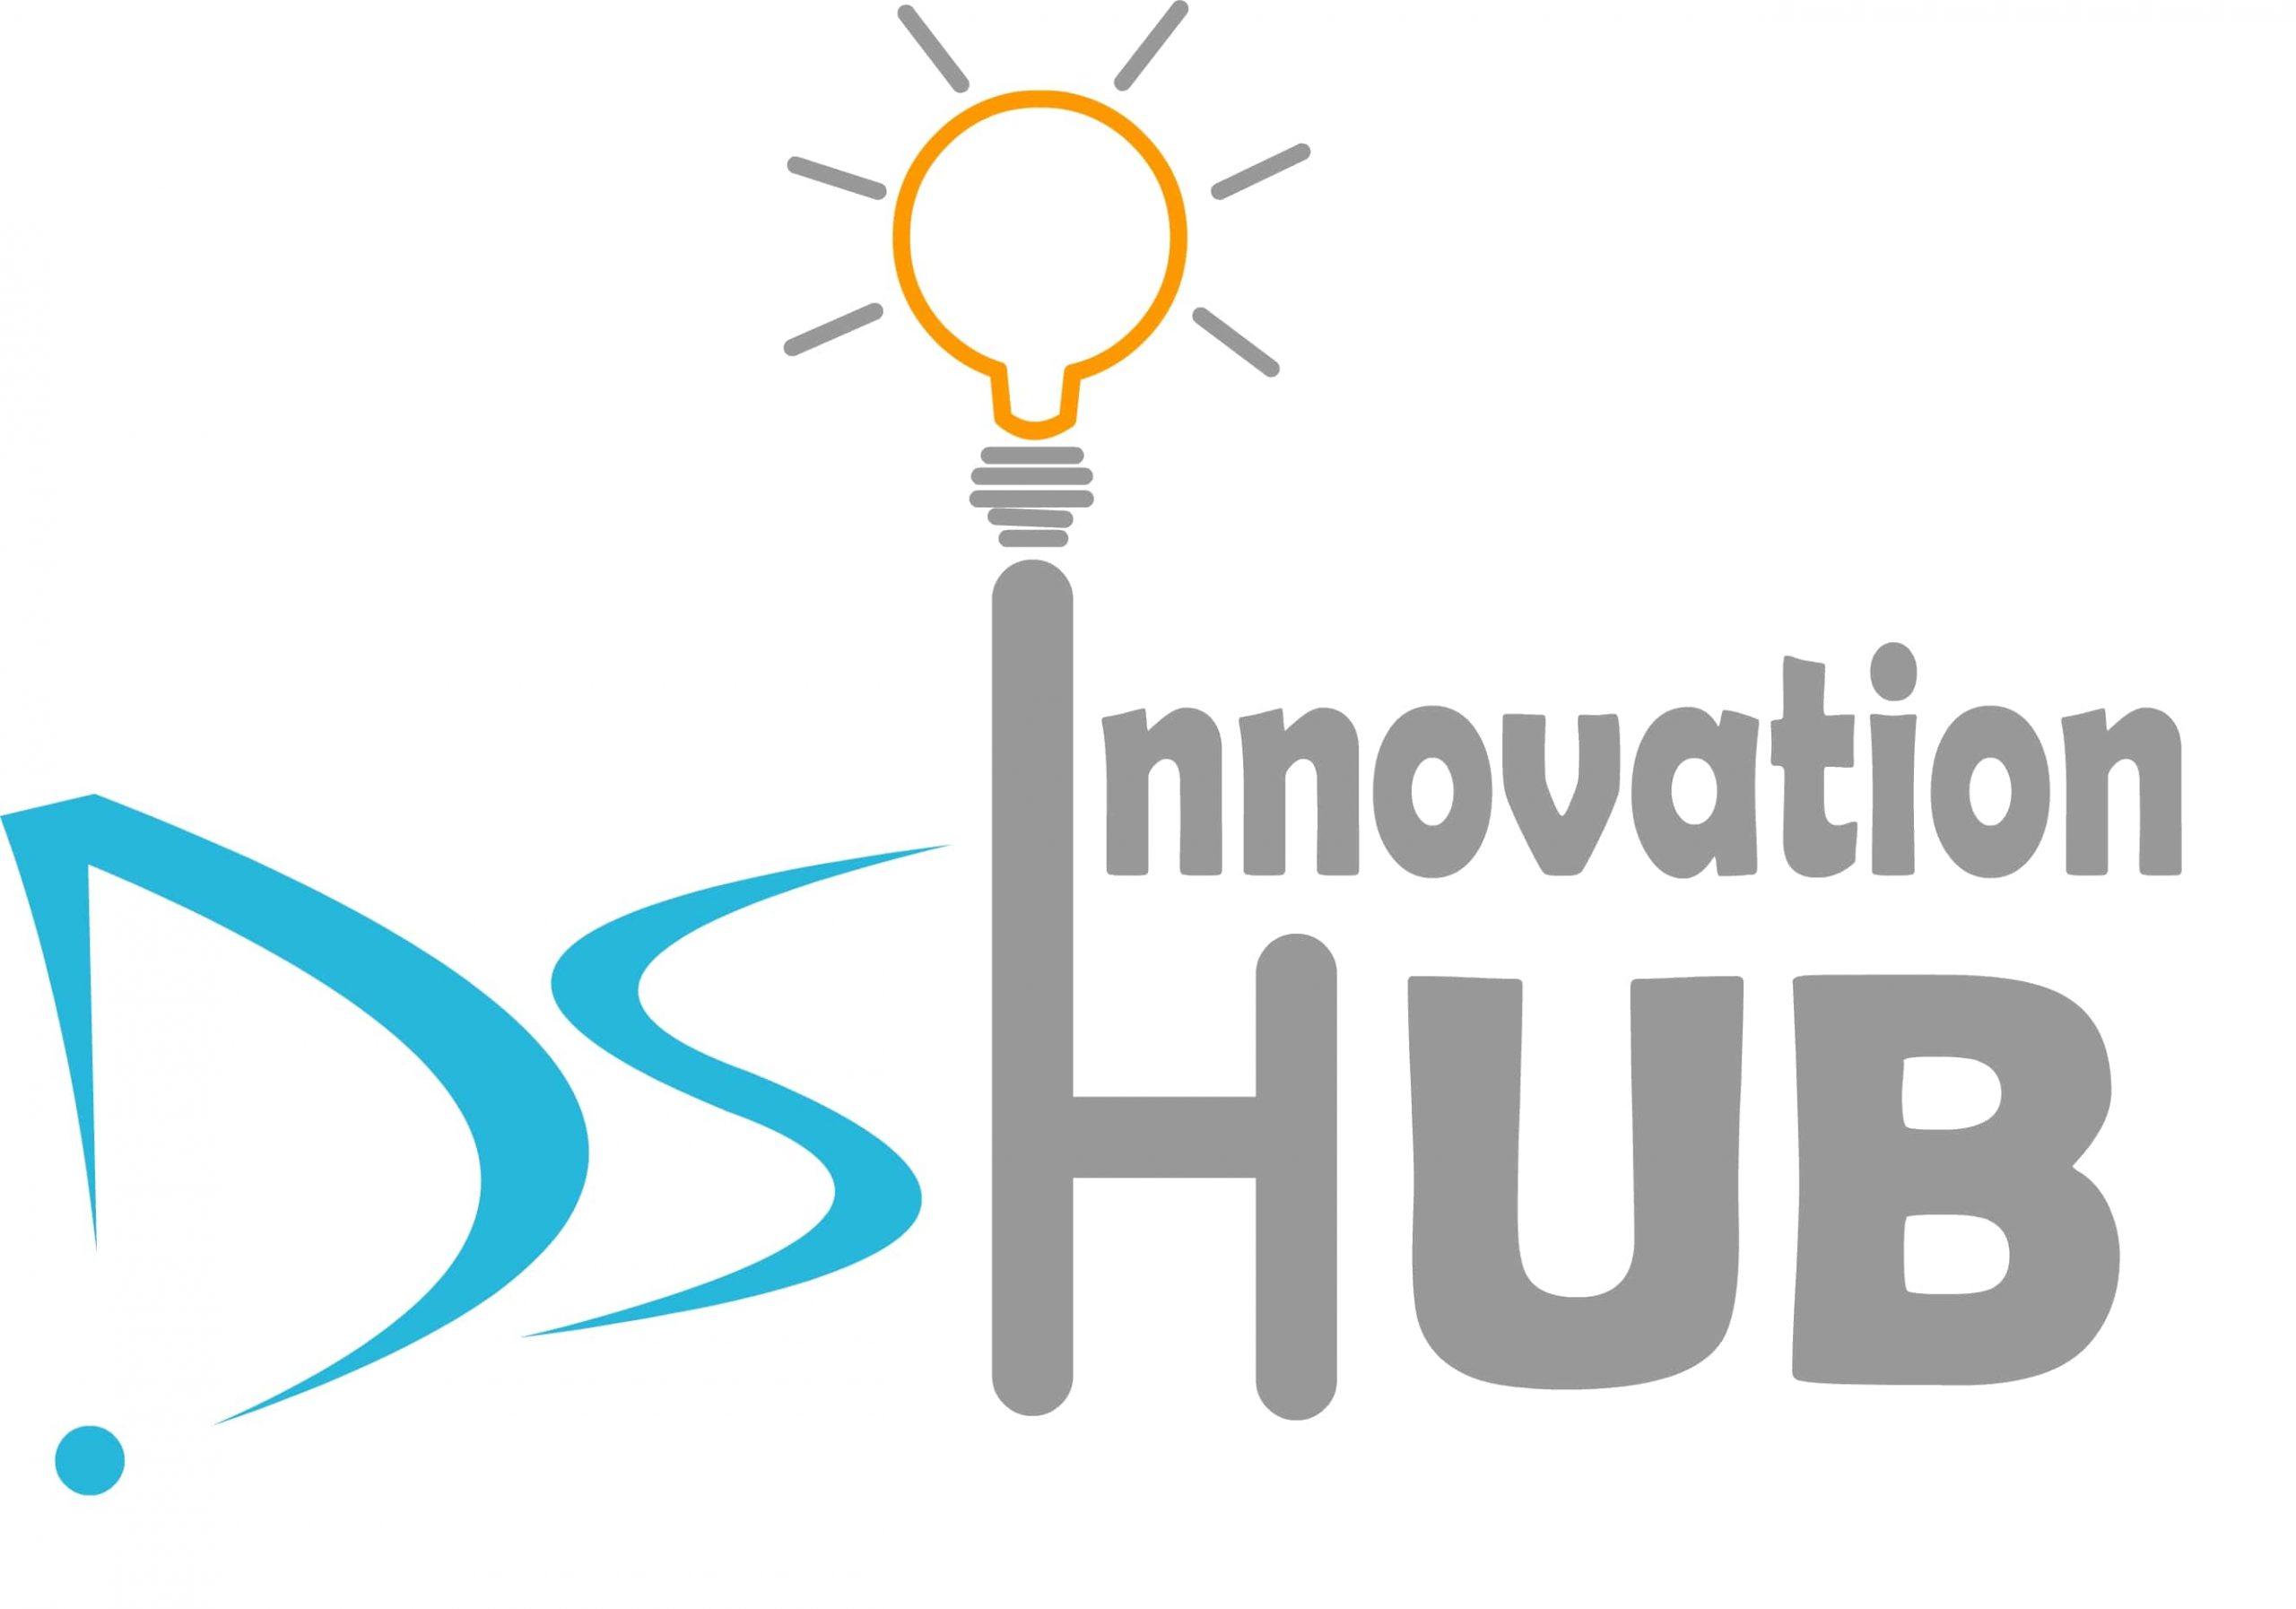 Delta State Innovation Hub - isnhubs